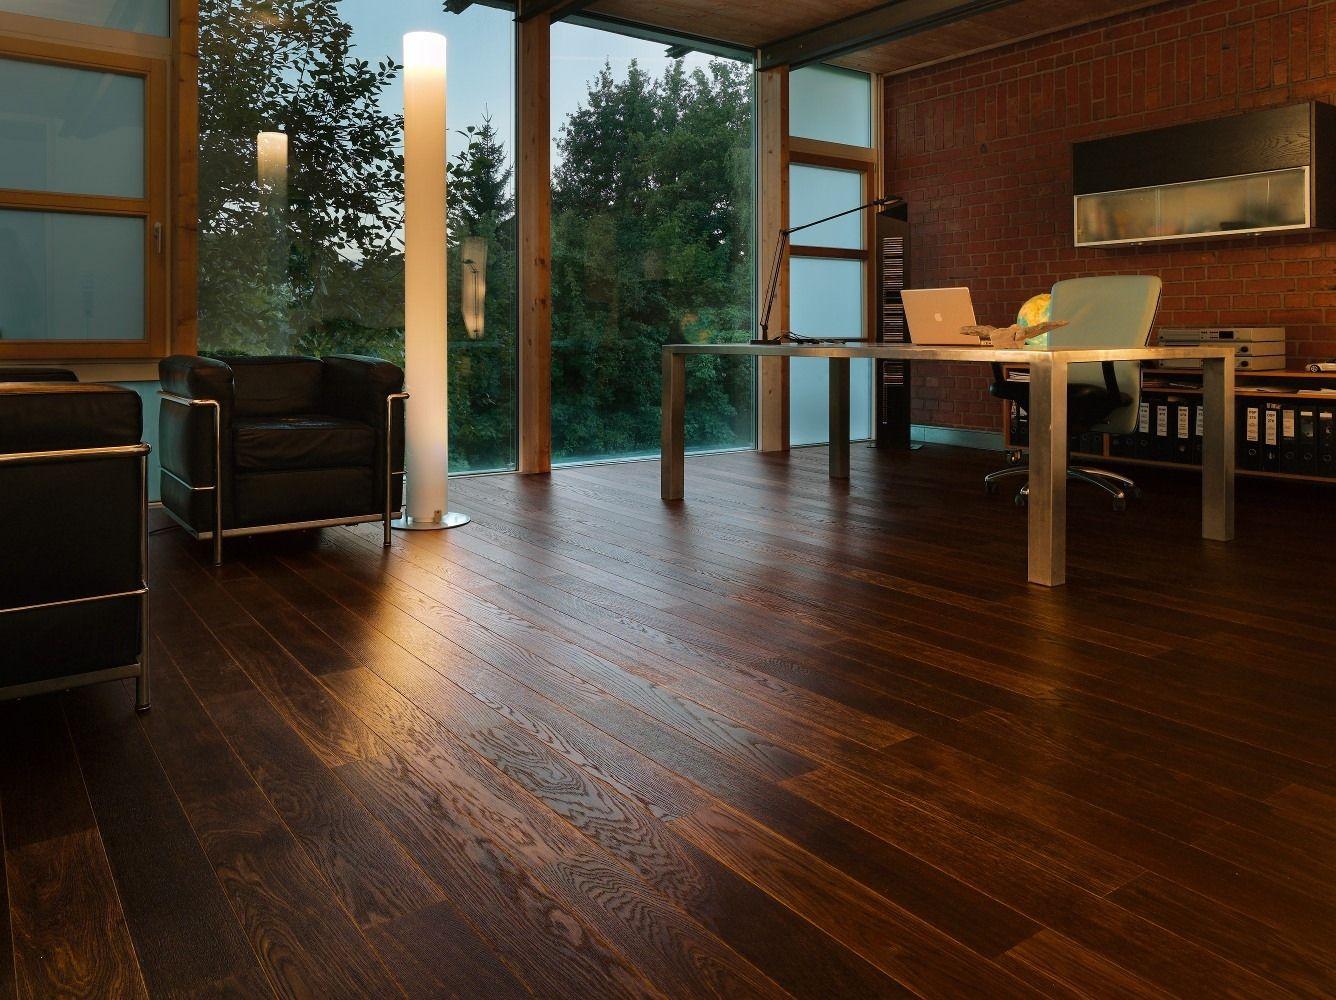 32 Elegant Küche Holzboden Engineered hardwood flooring